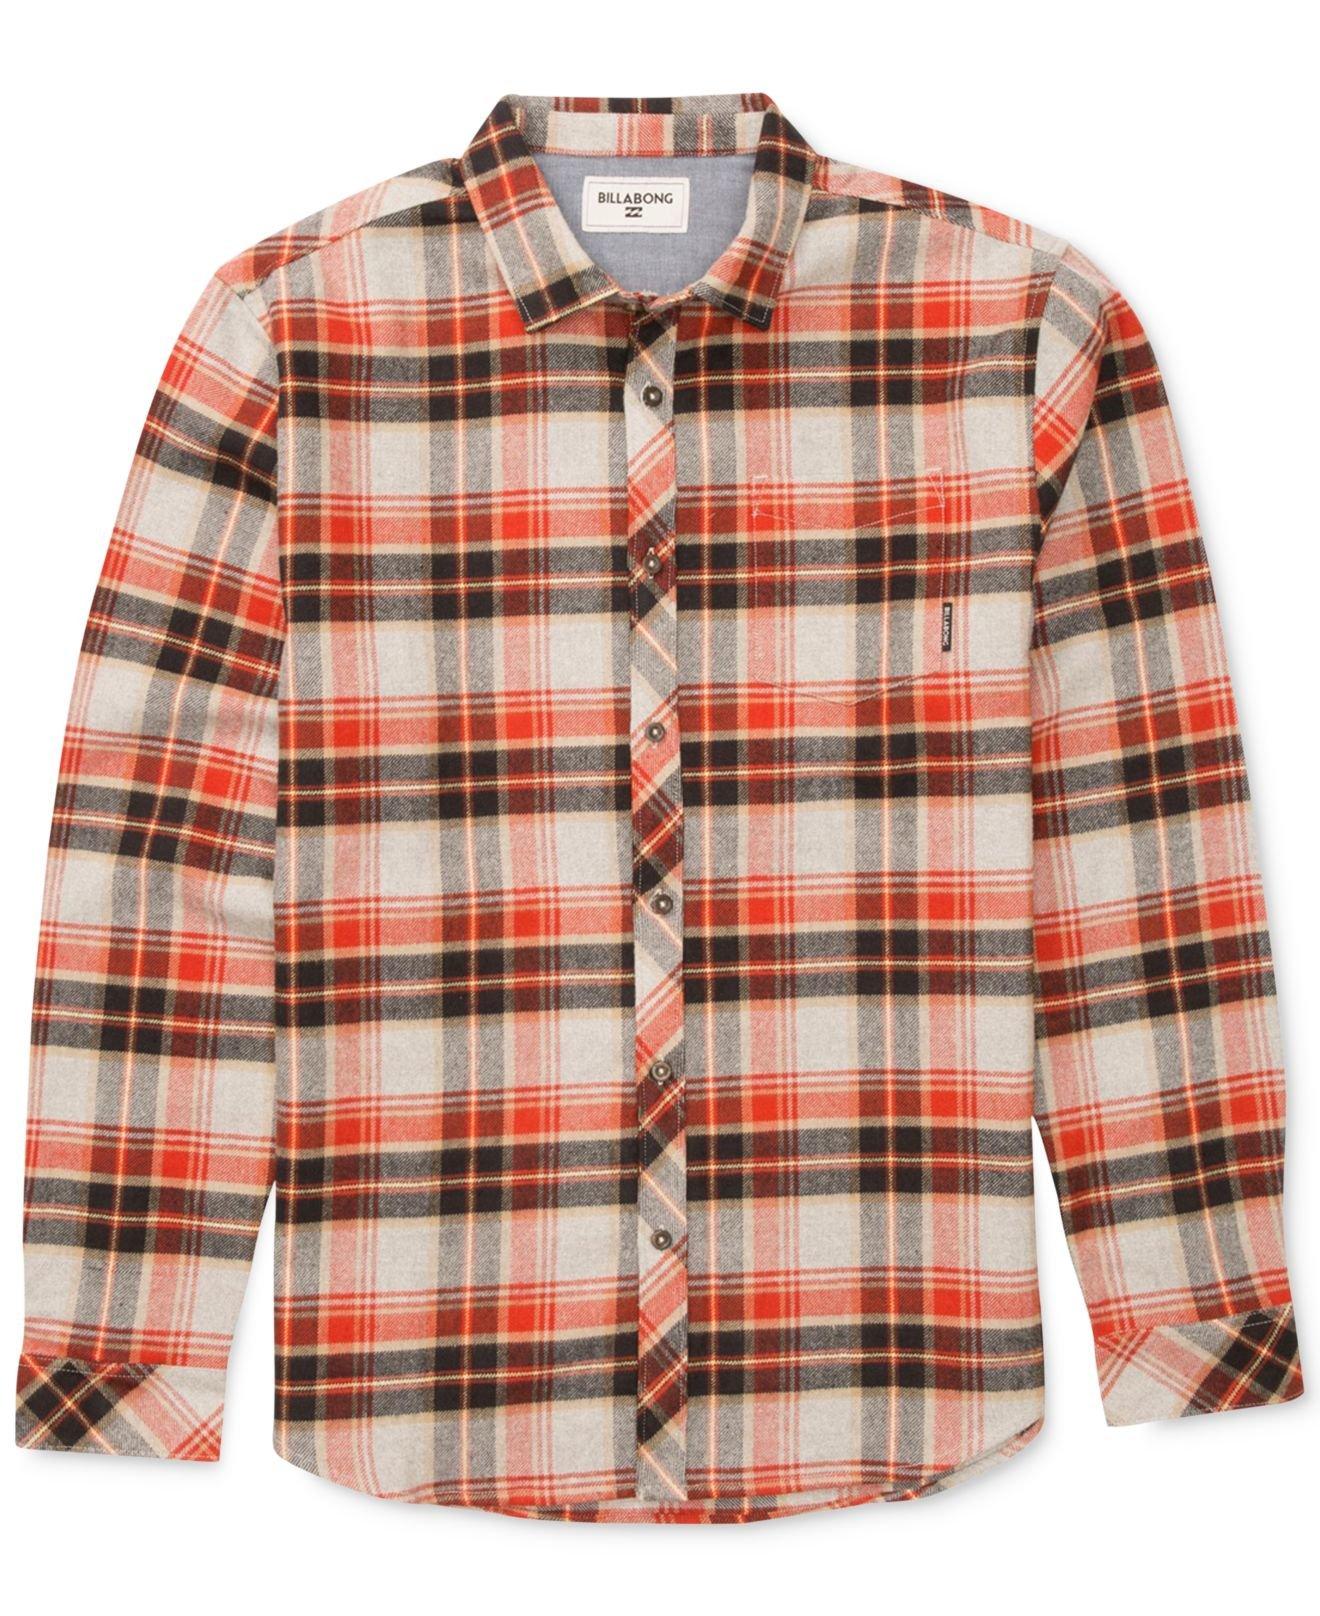 Billabong Henderson Long Sleeve Plaid Flannel Shirt For